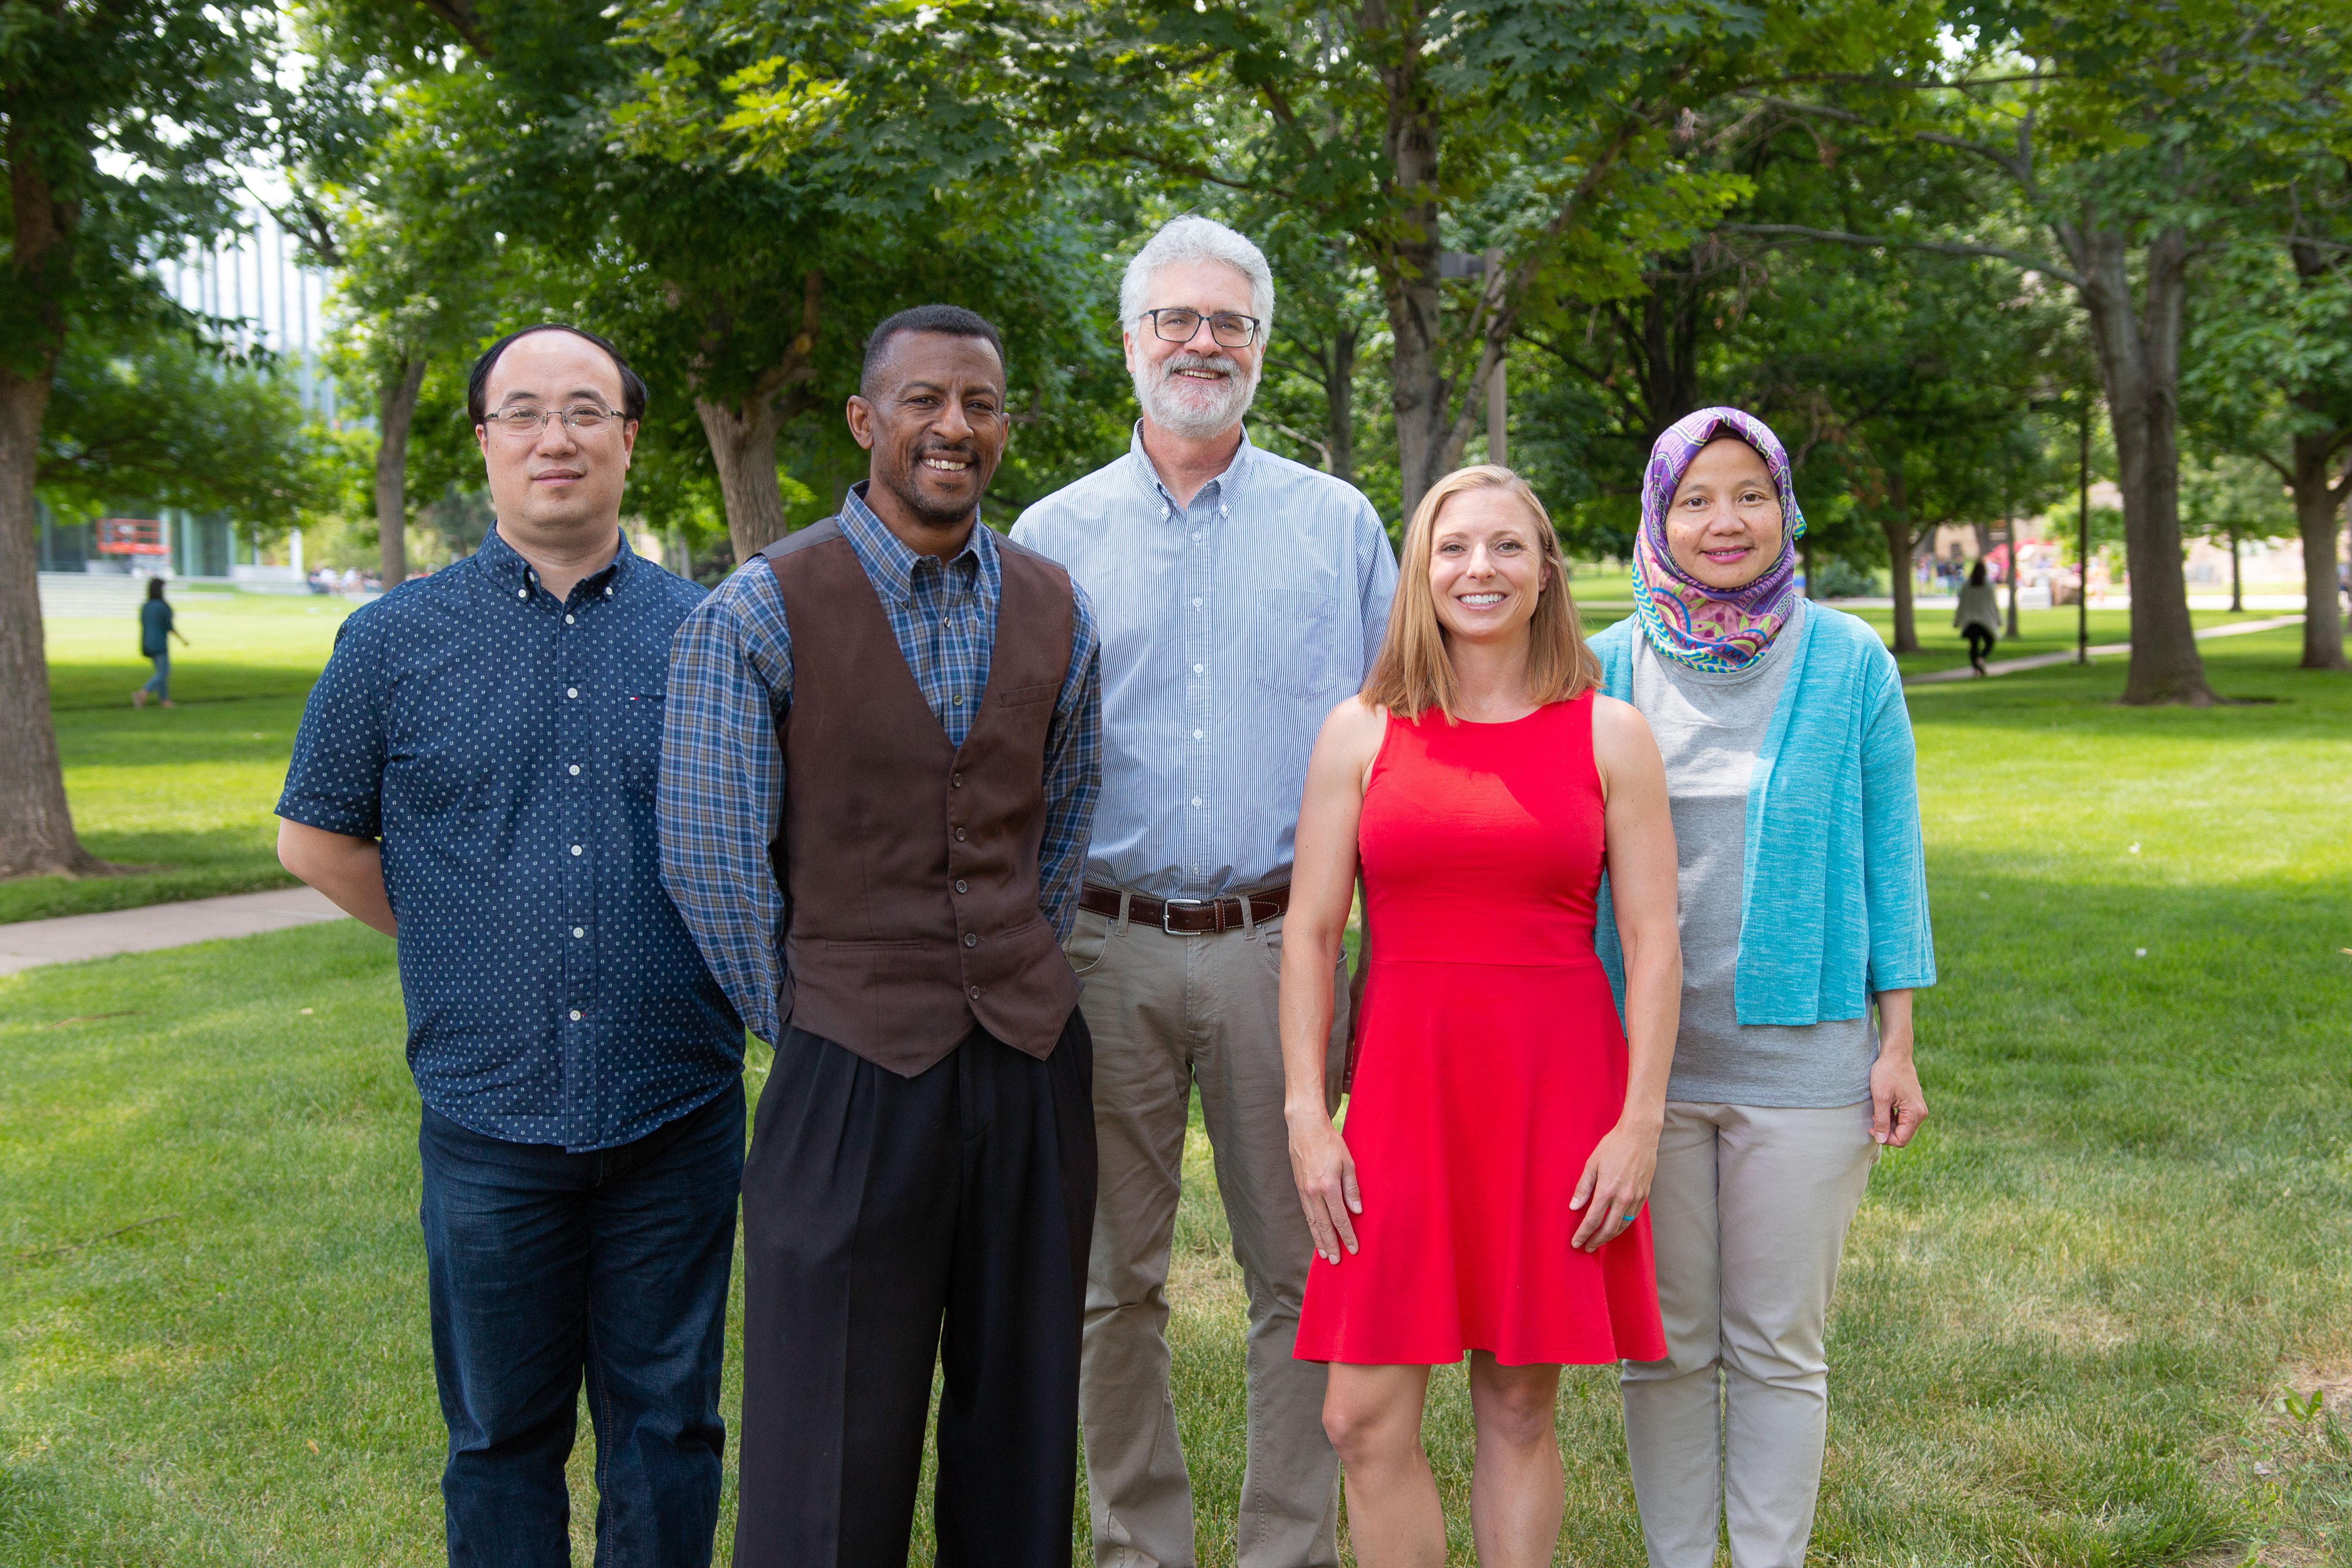 Daniels Fund Faculty Fellows Hua Wang, Derrick Hudson, Scott Houser, Olivia Burgess and Mirna Mattjik